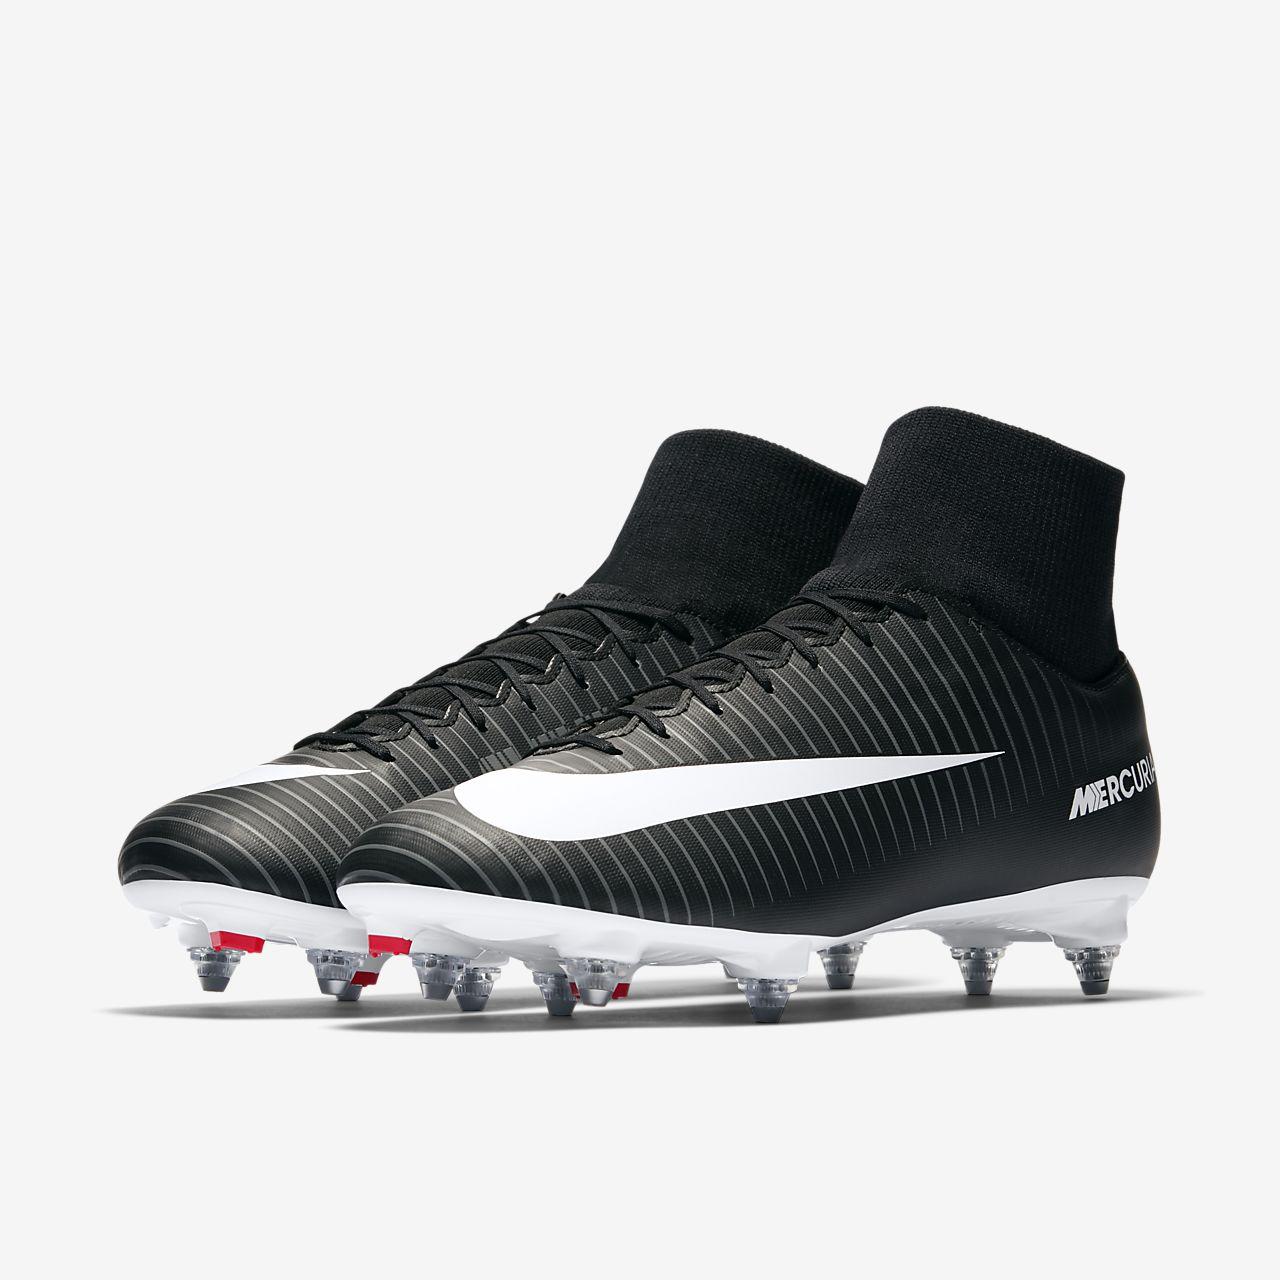 De Nike Mercurial Vi Dynamic Football À Chaussure Pour Terrain Victory Gras Fit Crampons 5AqL34RcjS